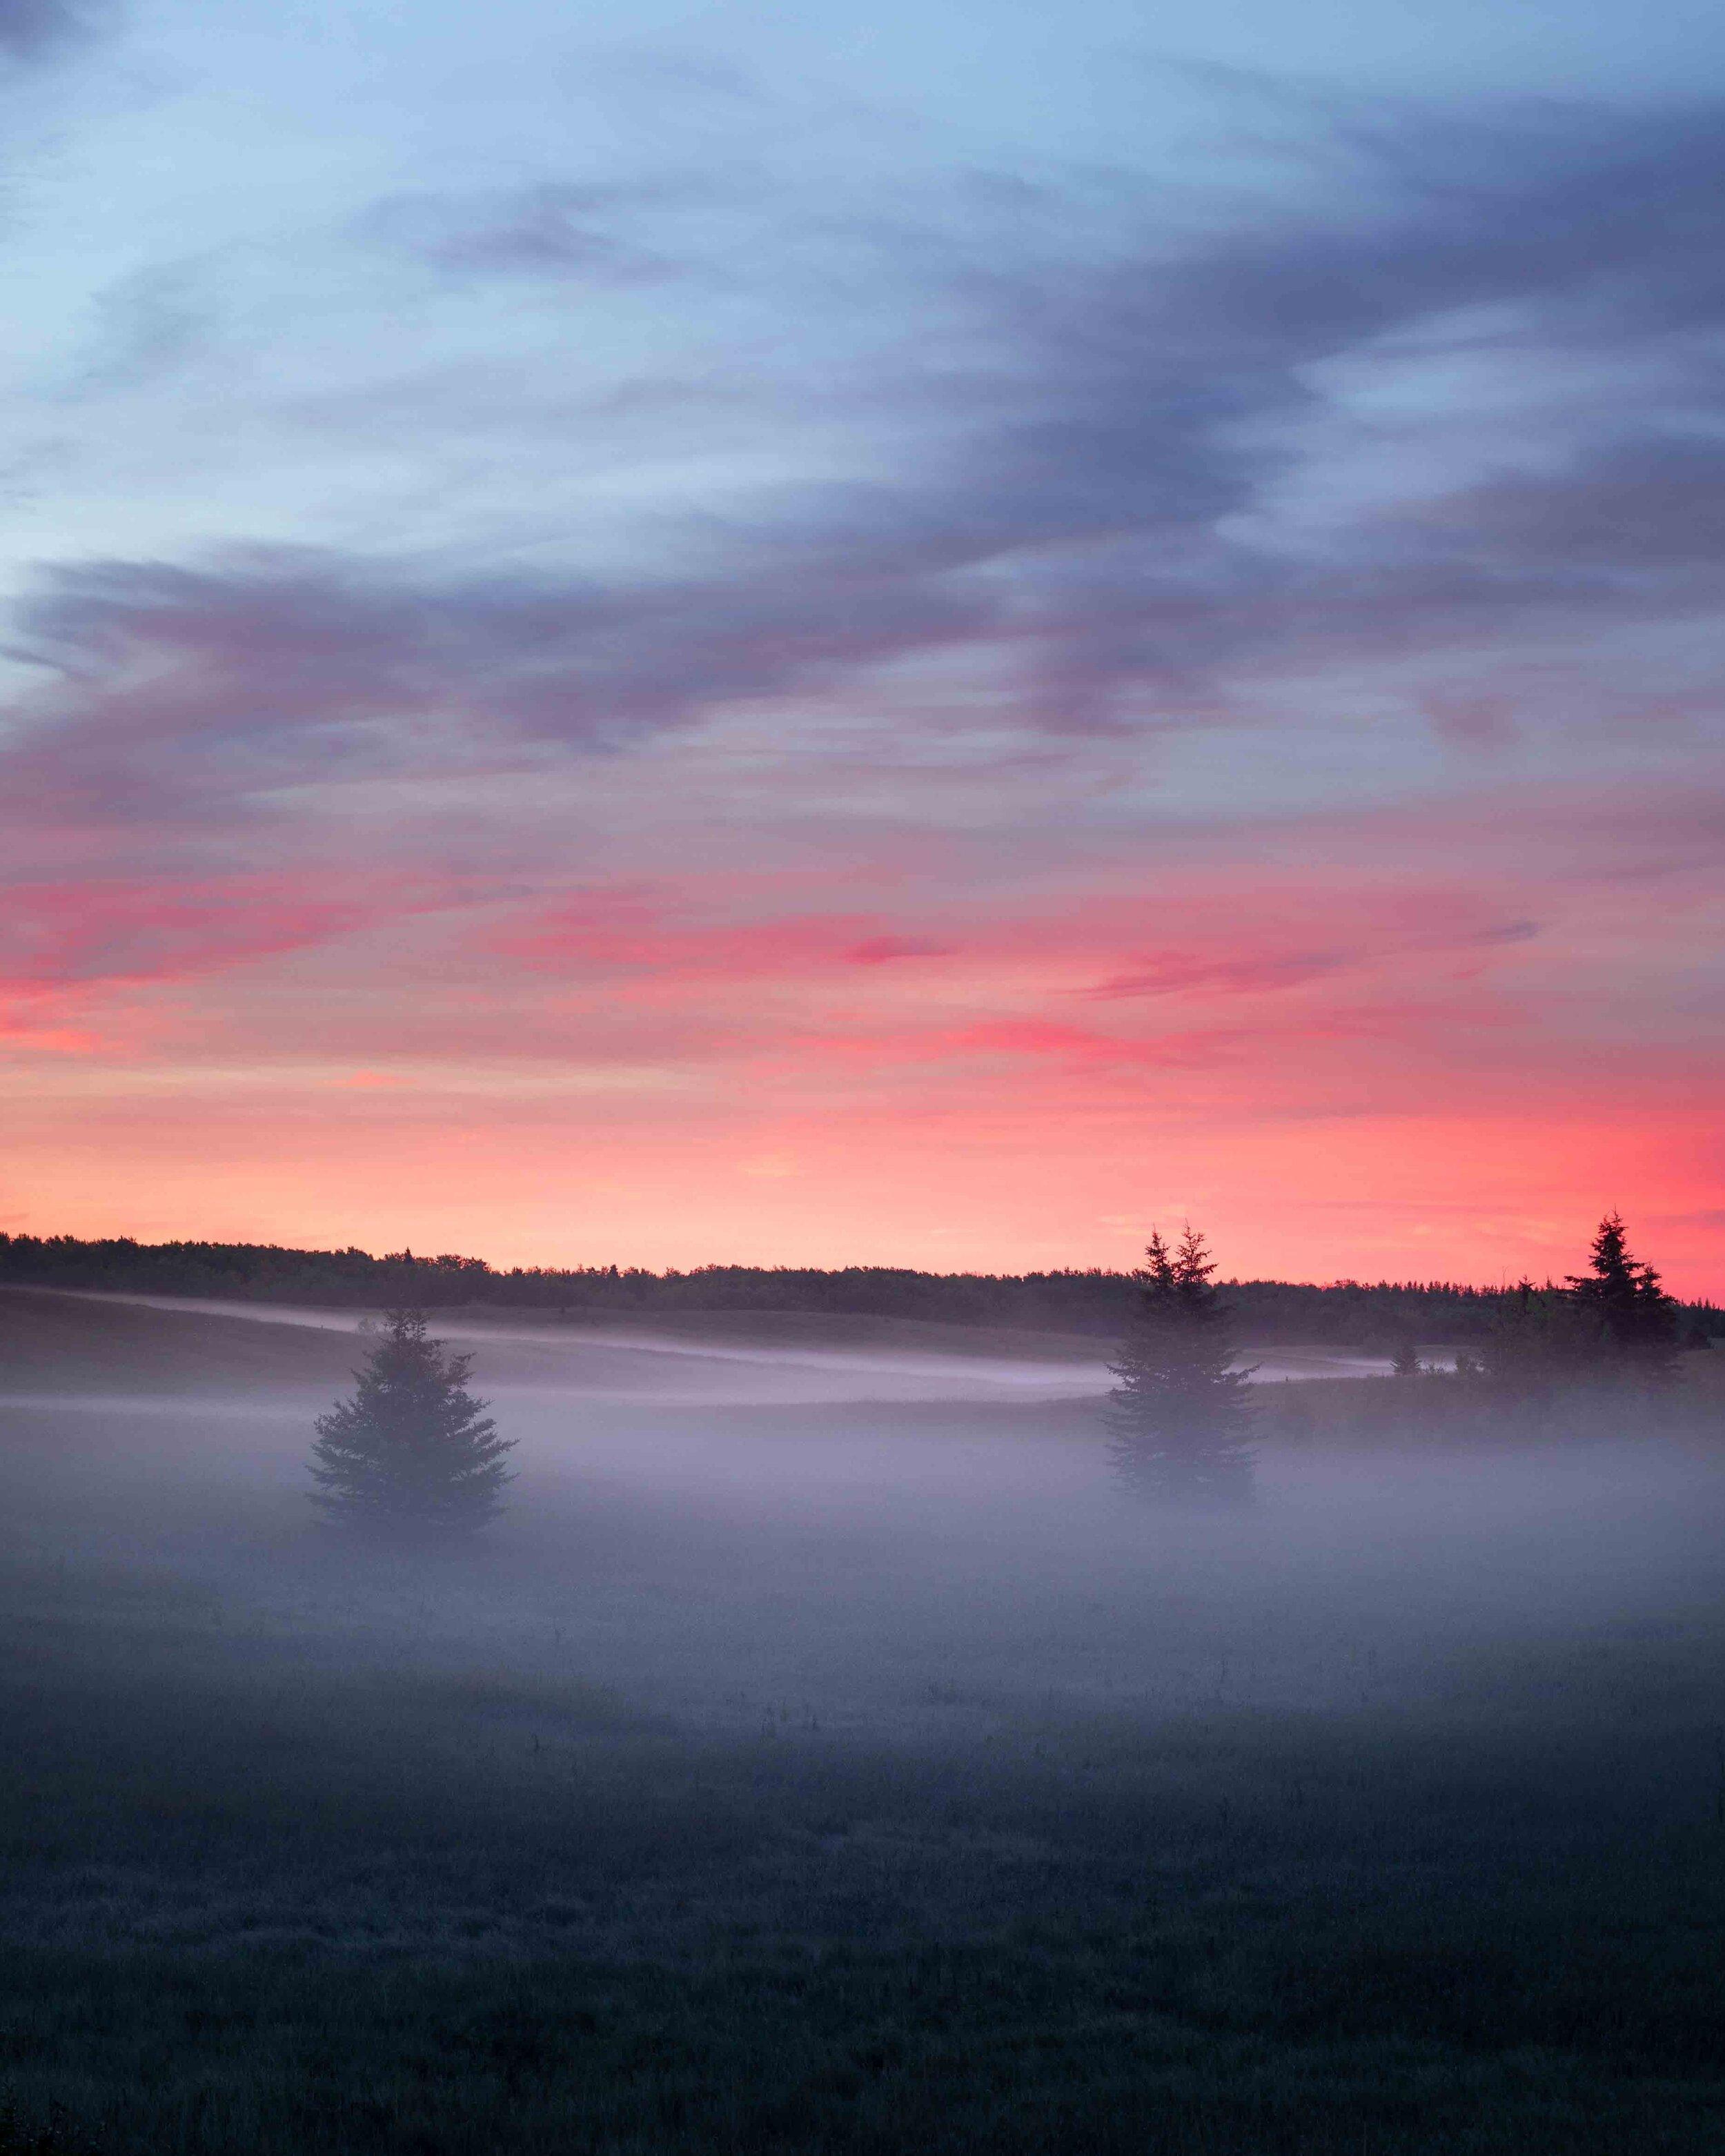 Sunrise at Lake Audy